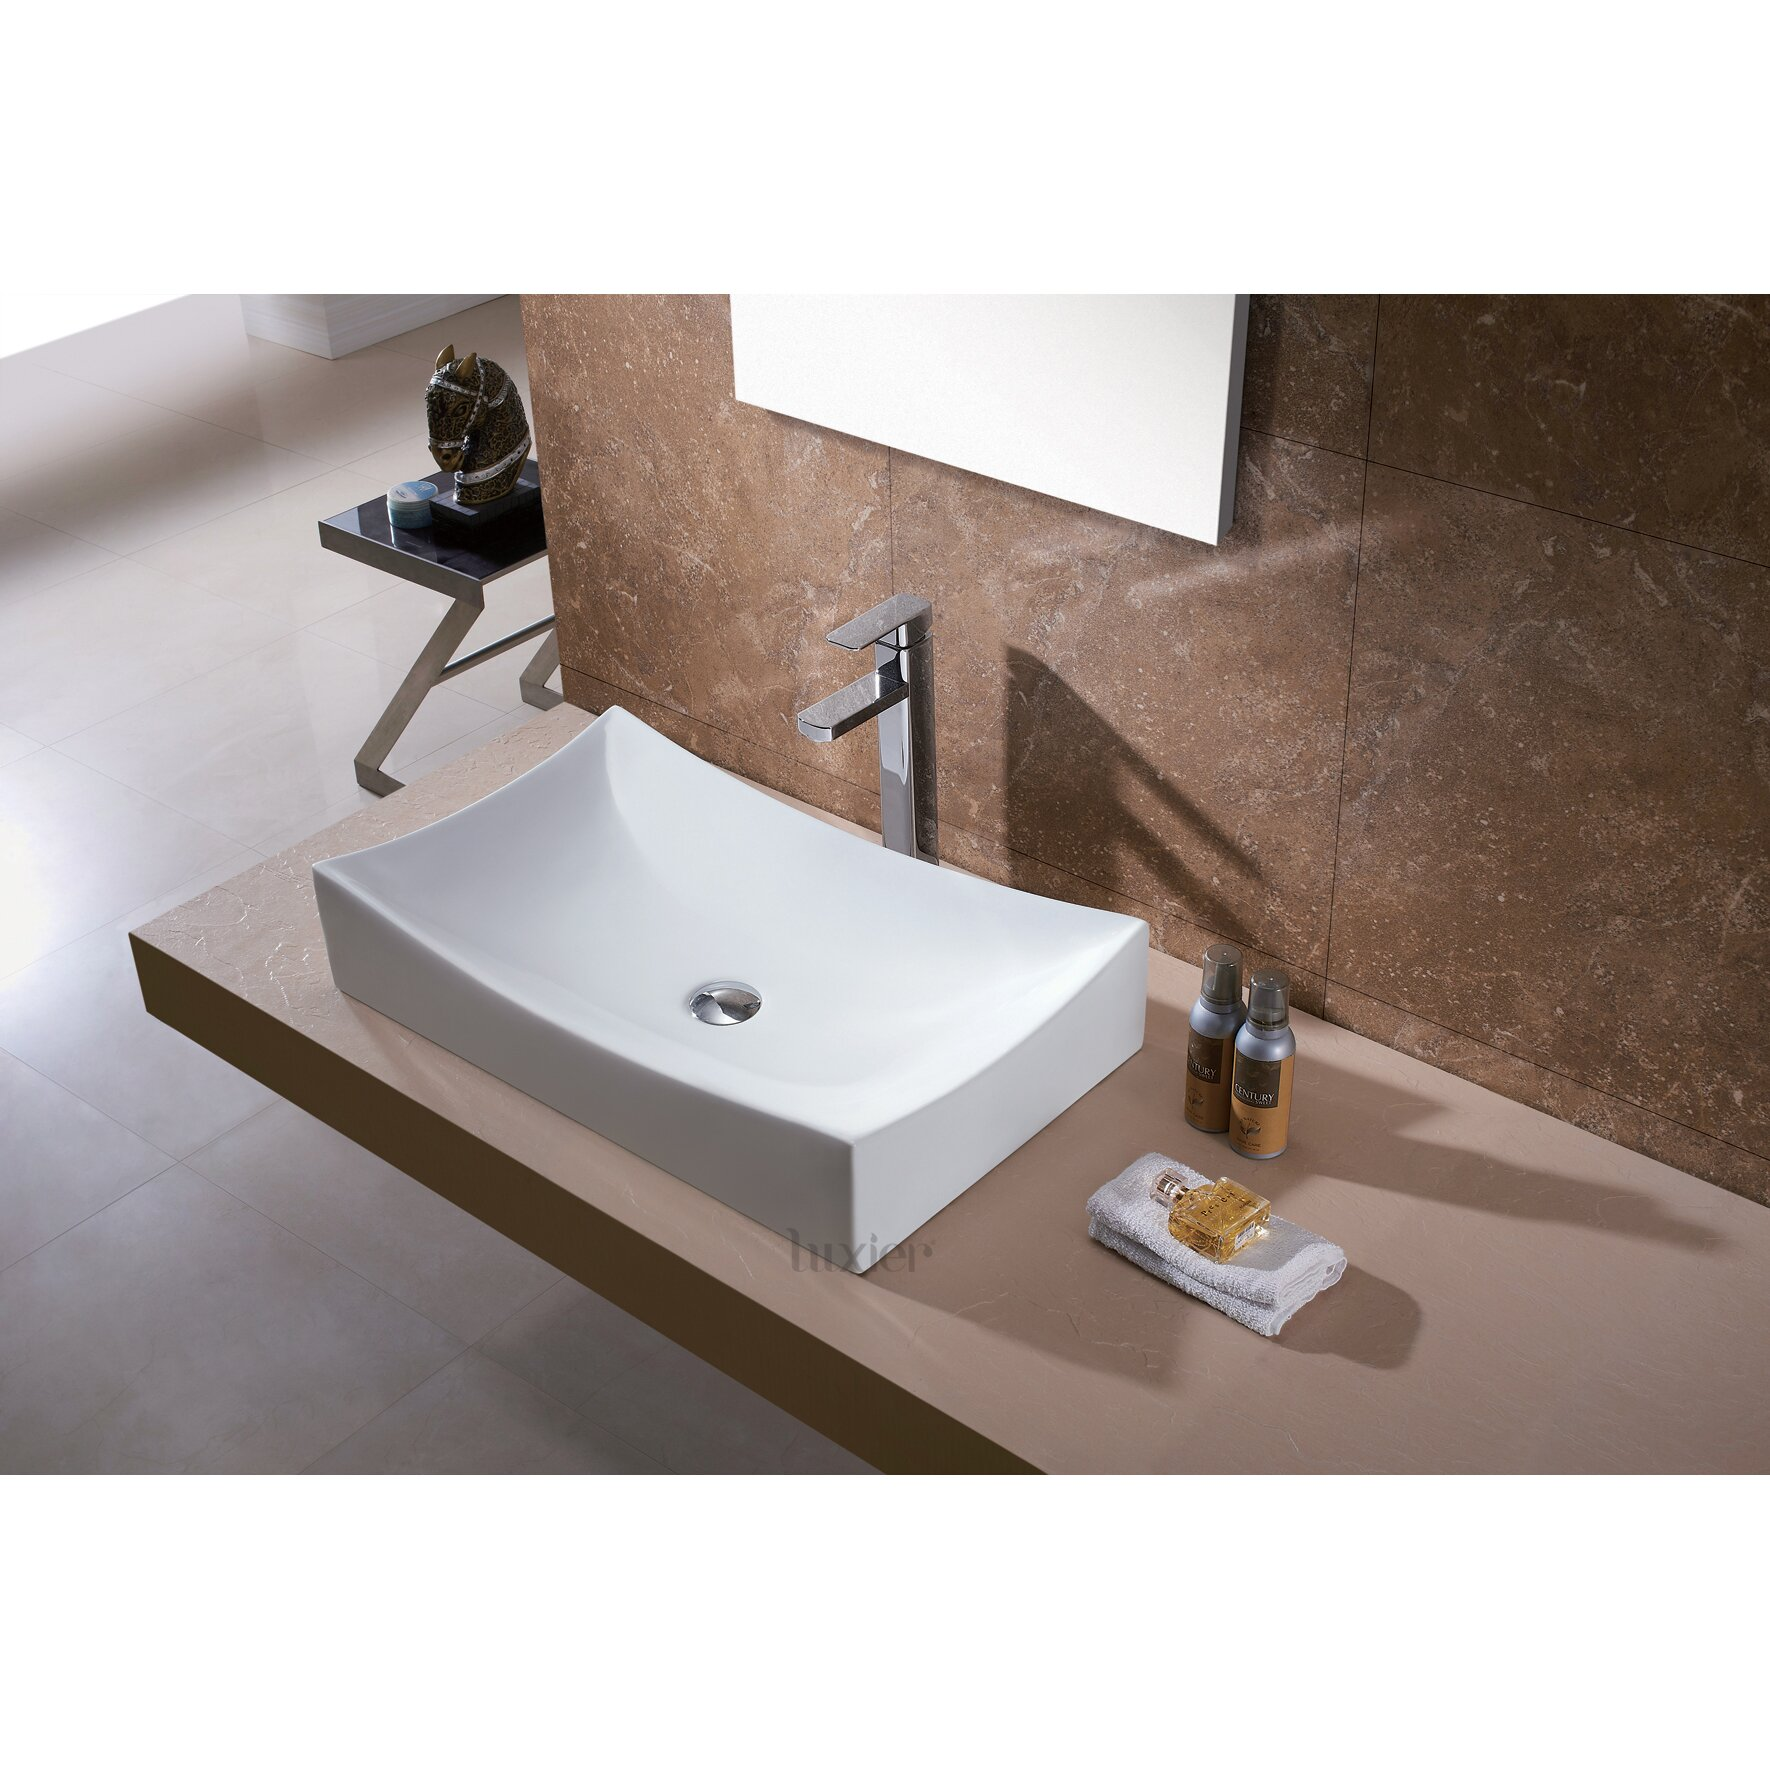 Luxier L-001 Bathroom Porcelain Ceramic Vessel Vanity Sink Art Basin